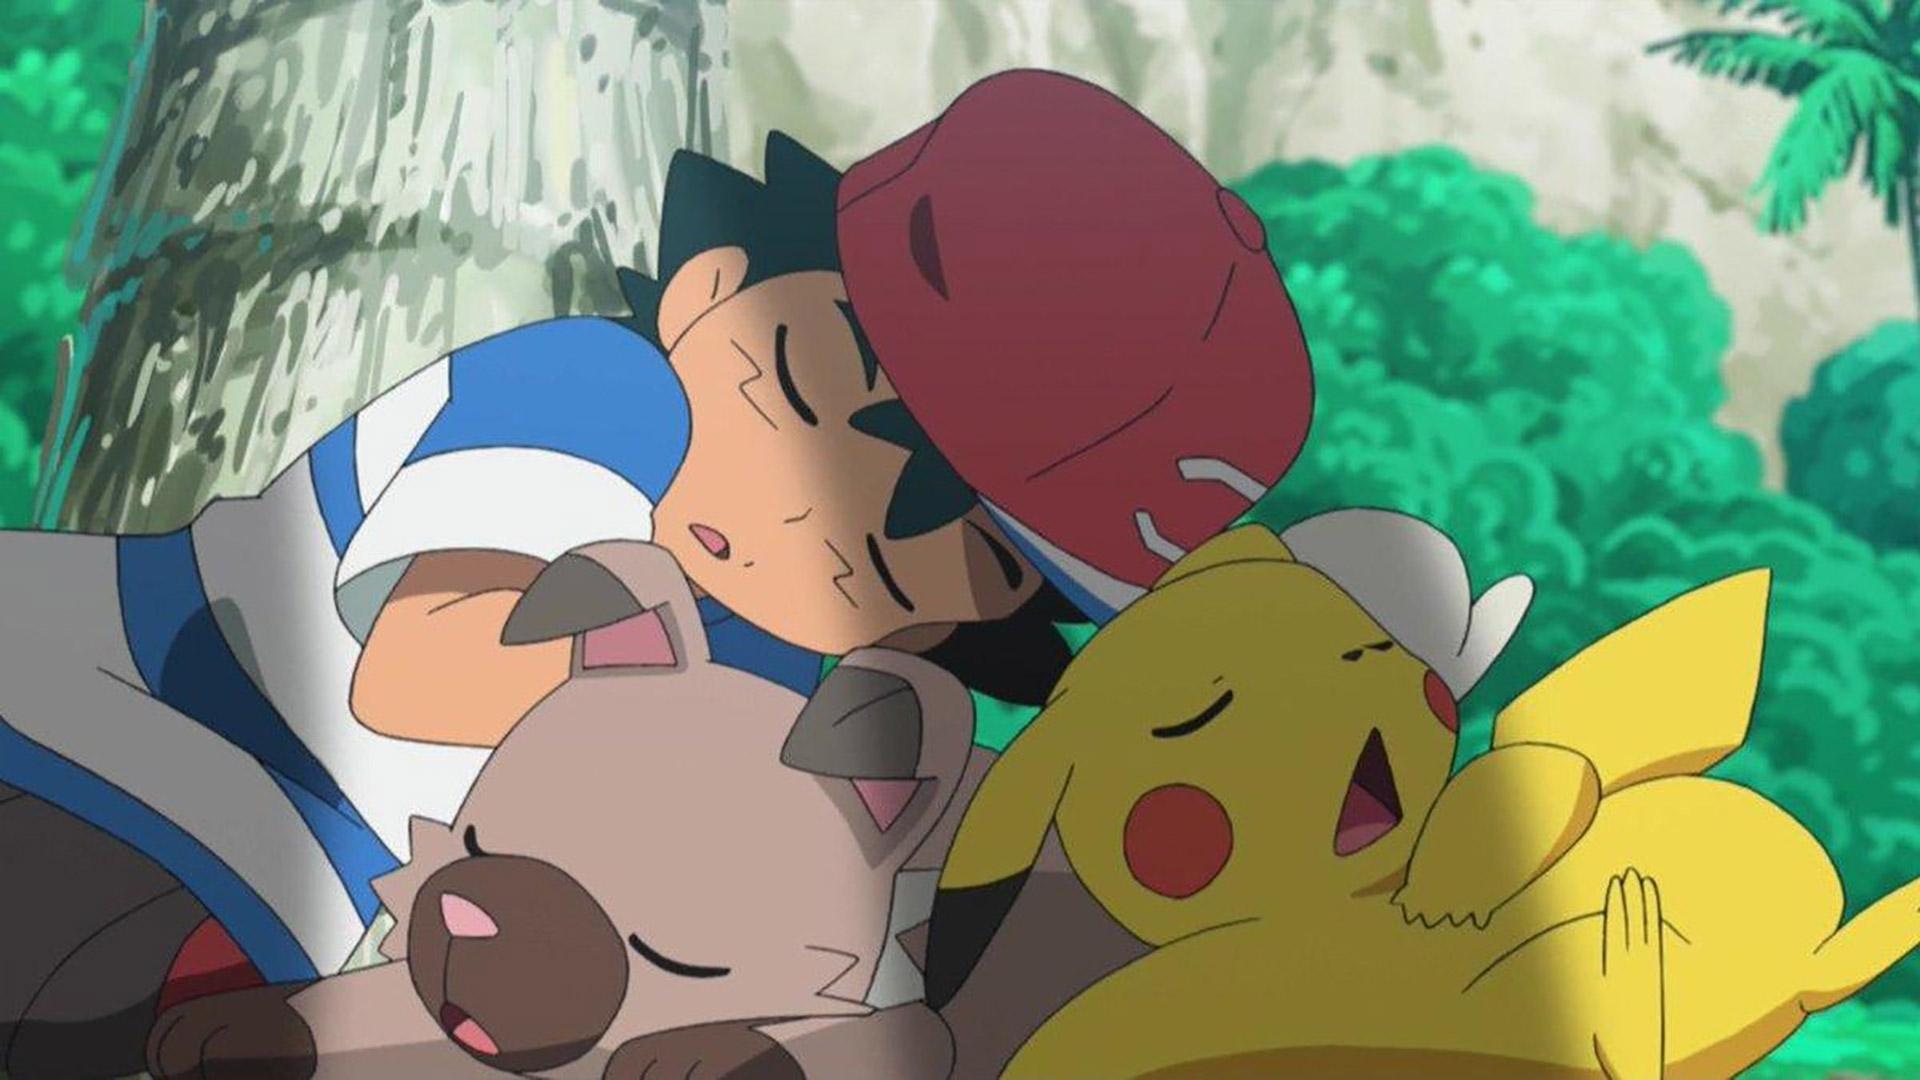 Pokemon Go Plus + and Pokemon Sleep announced